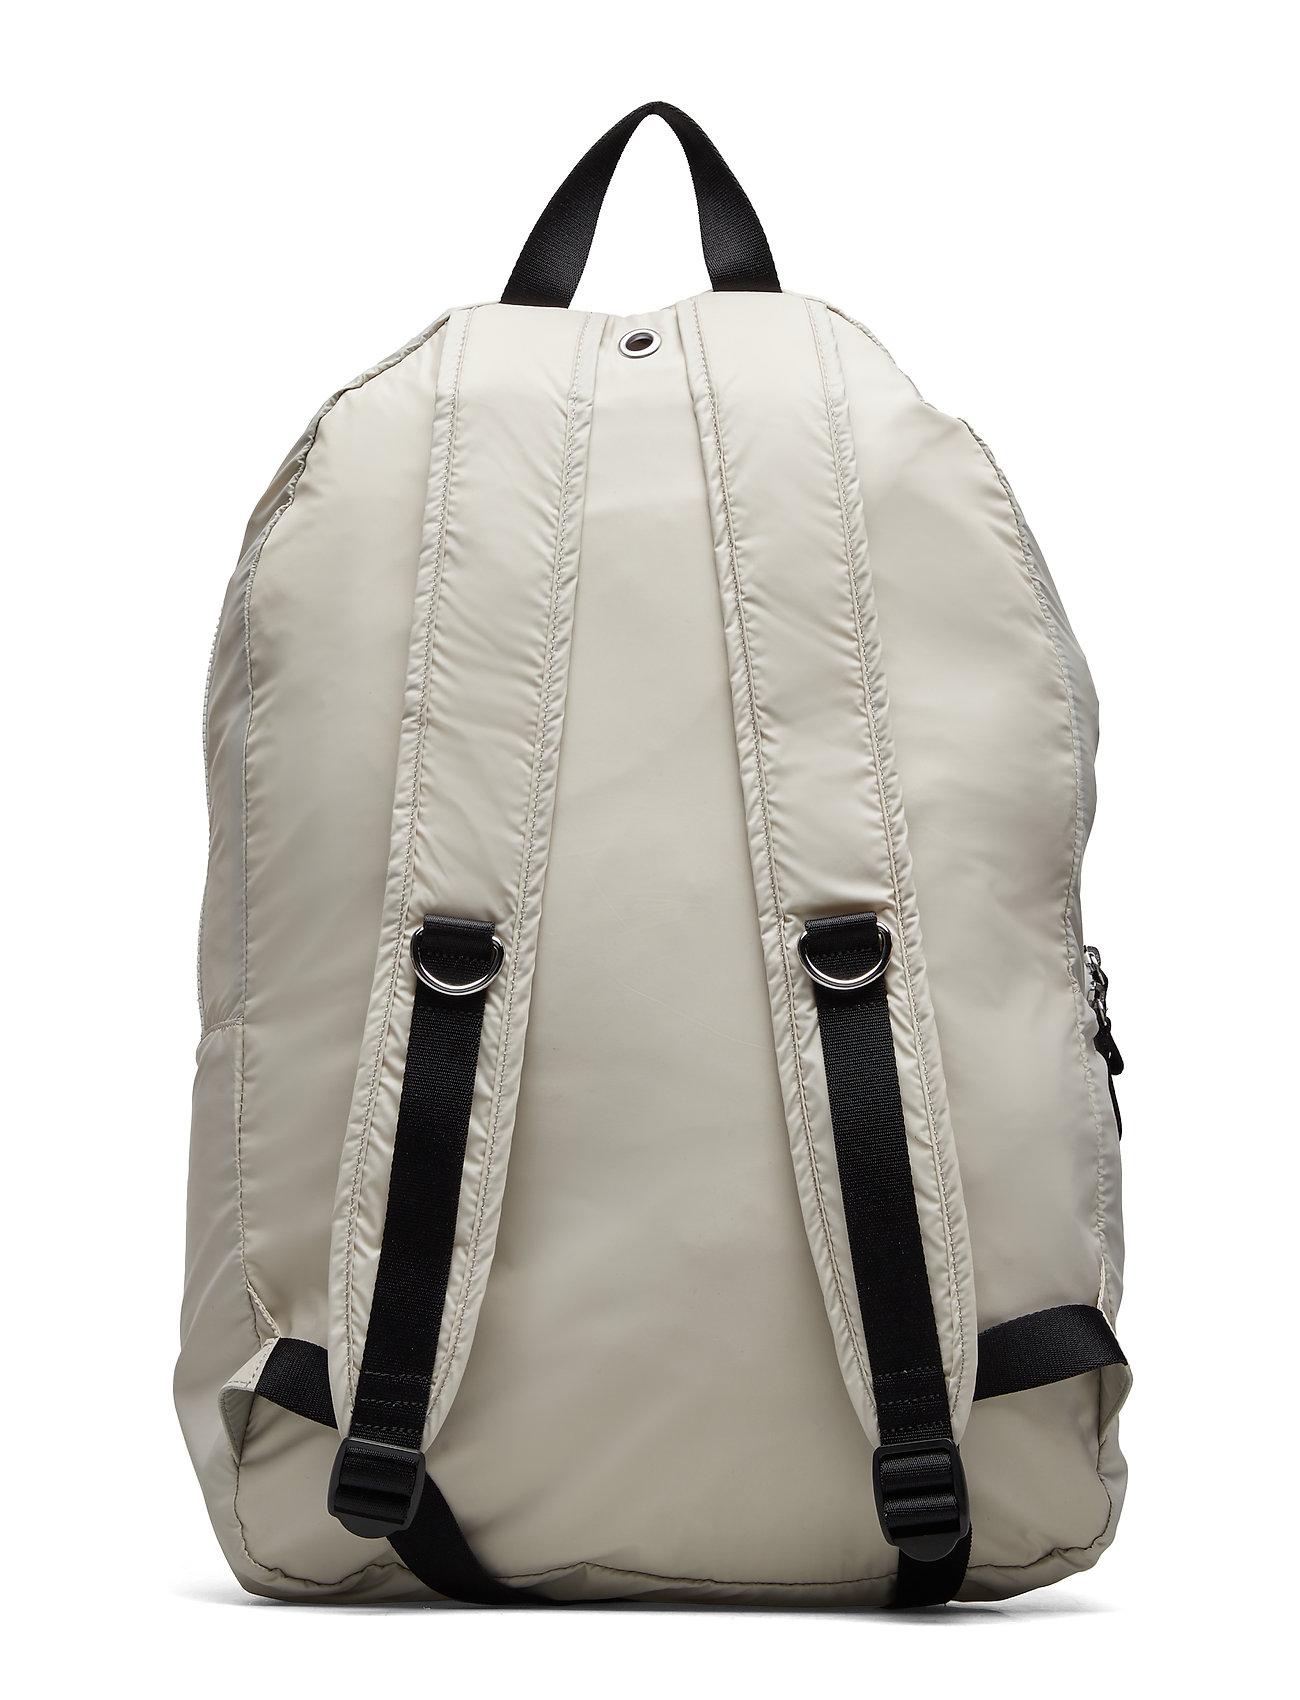 Klein Backpack Backpack Zip 50cm0sandCalvin Performance Zip 50cm0sandCalvin yfb76gvY